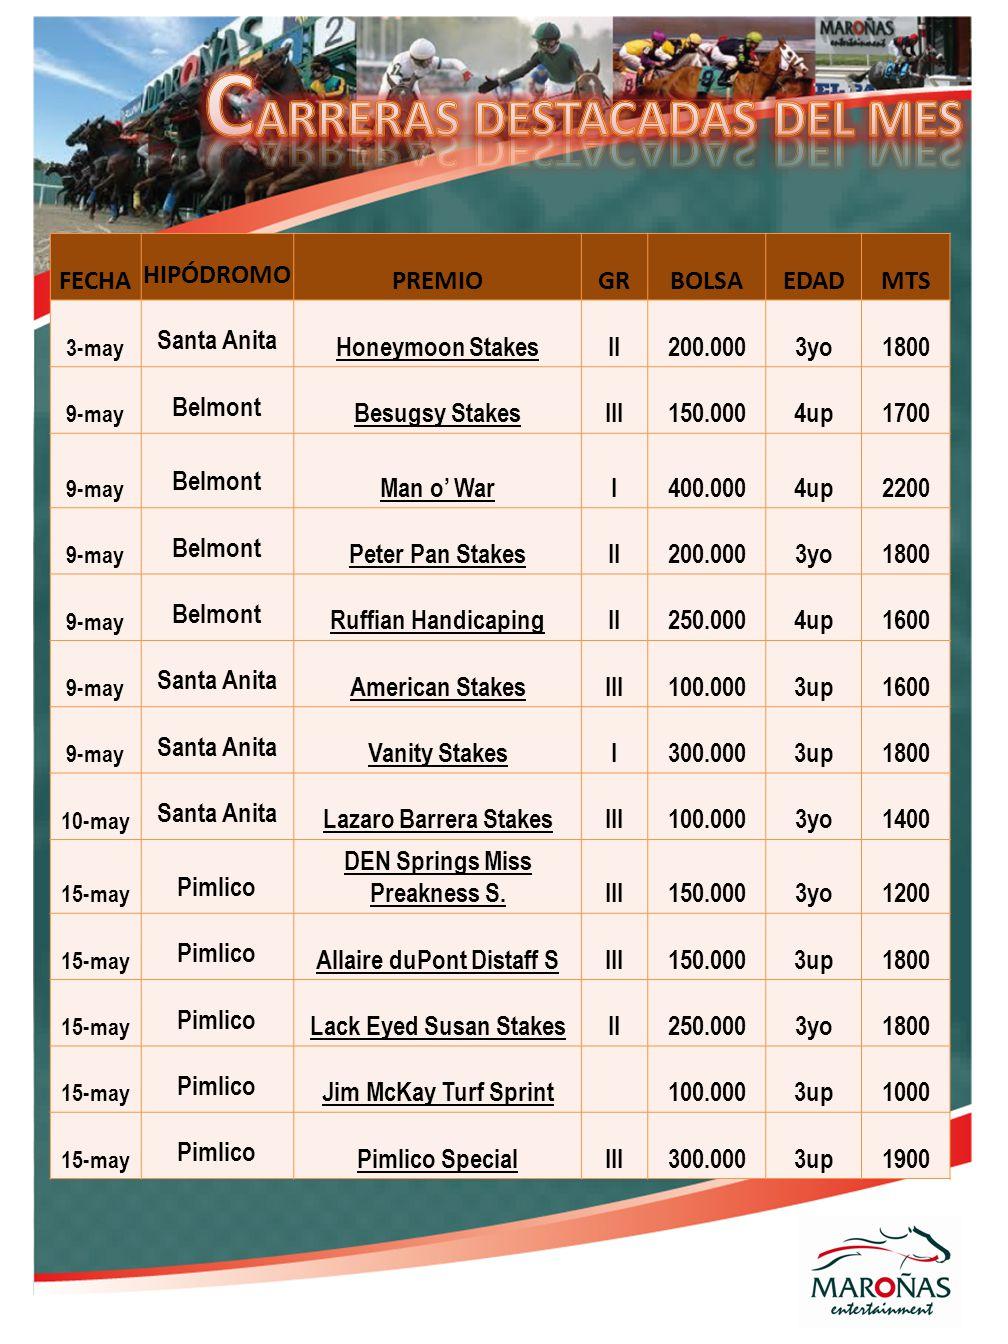 FECHA HIPÓDROMO PREMIOGRBOLSAEDADMTS 3-may Santa Anita Honeymoon StakesII200.0003yo1800 9-may Belmont Besugsy StakesIII150.0004up1700 9-may Belmont Man o' WarI400.0004up2200 9-may Belmont Peter Pan StakesII200.0003yo1800 9-may Belmont Ruffian HandicapingII250.0004up1600 9-may Santa Anita American StakesIII100.0003up1600 9-may Santa Anita Vanity StakesI300.0003up1800 10-may Santa Anita Lazaro Barrera StakesIII100.0003yo1400 15-may Pimlico DEN Springs Miss Preakness S.III150.0003yo1200 15-may Pimlico Allaire duPont Distaff SIII150.0003up1800 15-may Pimlico Lack Eyed Susan StakesII250.0003yo1800 15-may Pimlico Jim McKay Turf Sprint100.0003up1000 15-may Pimlico Pimlico SpecialIII300.0003up1900